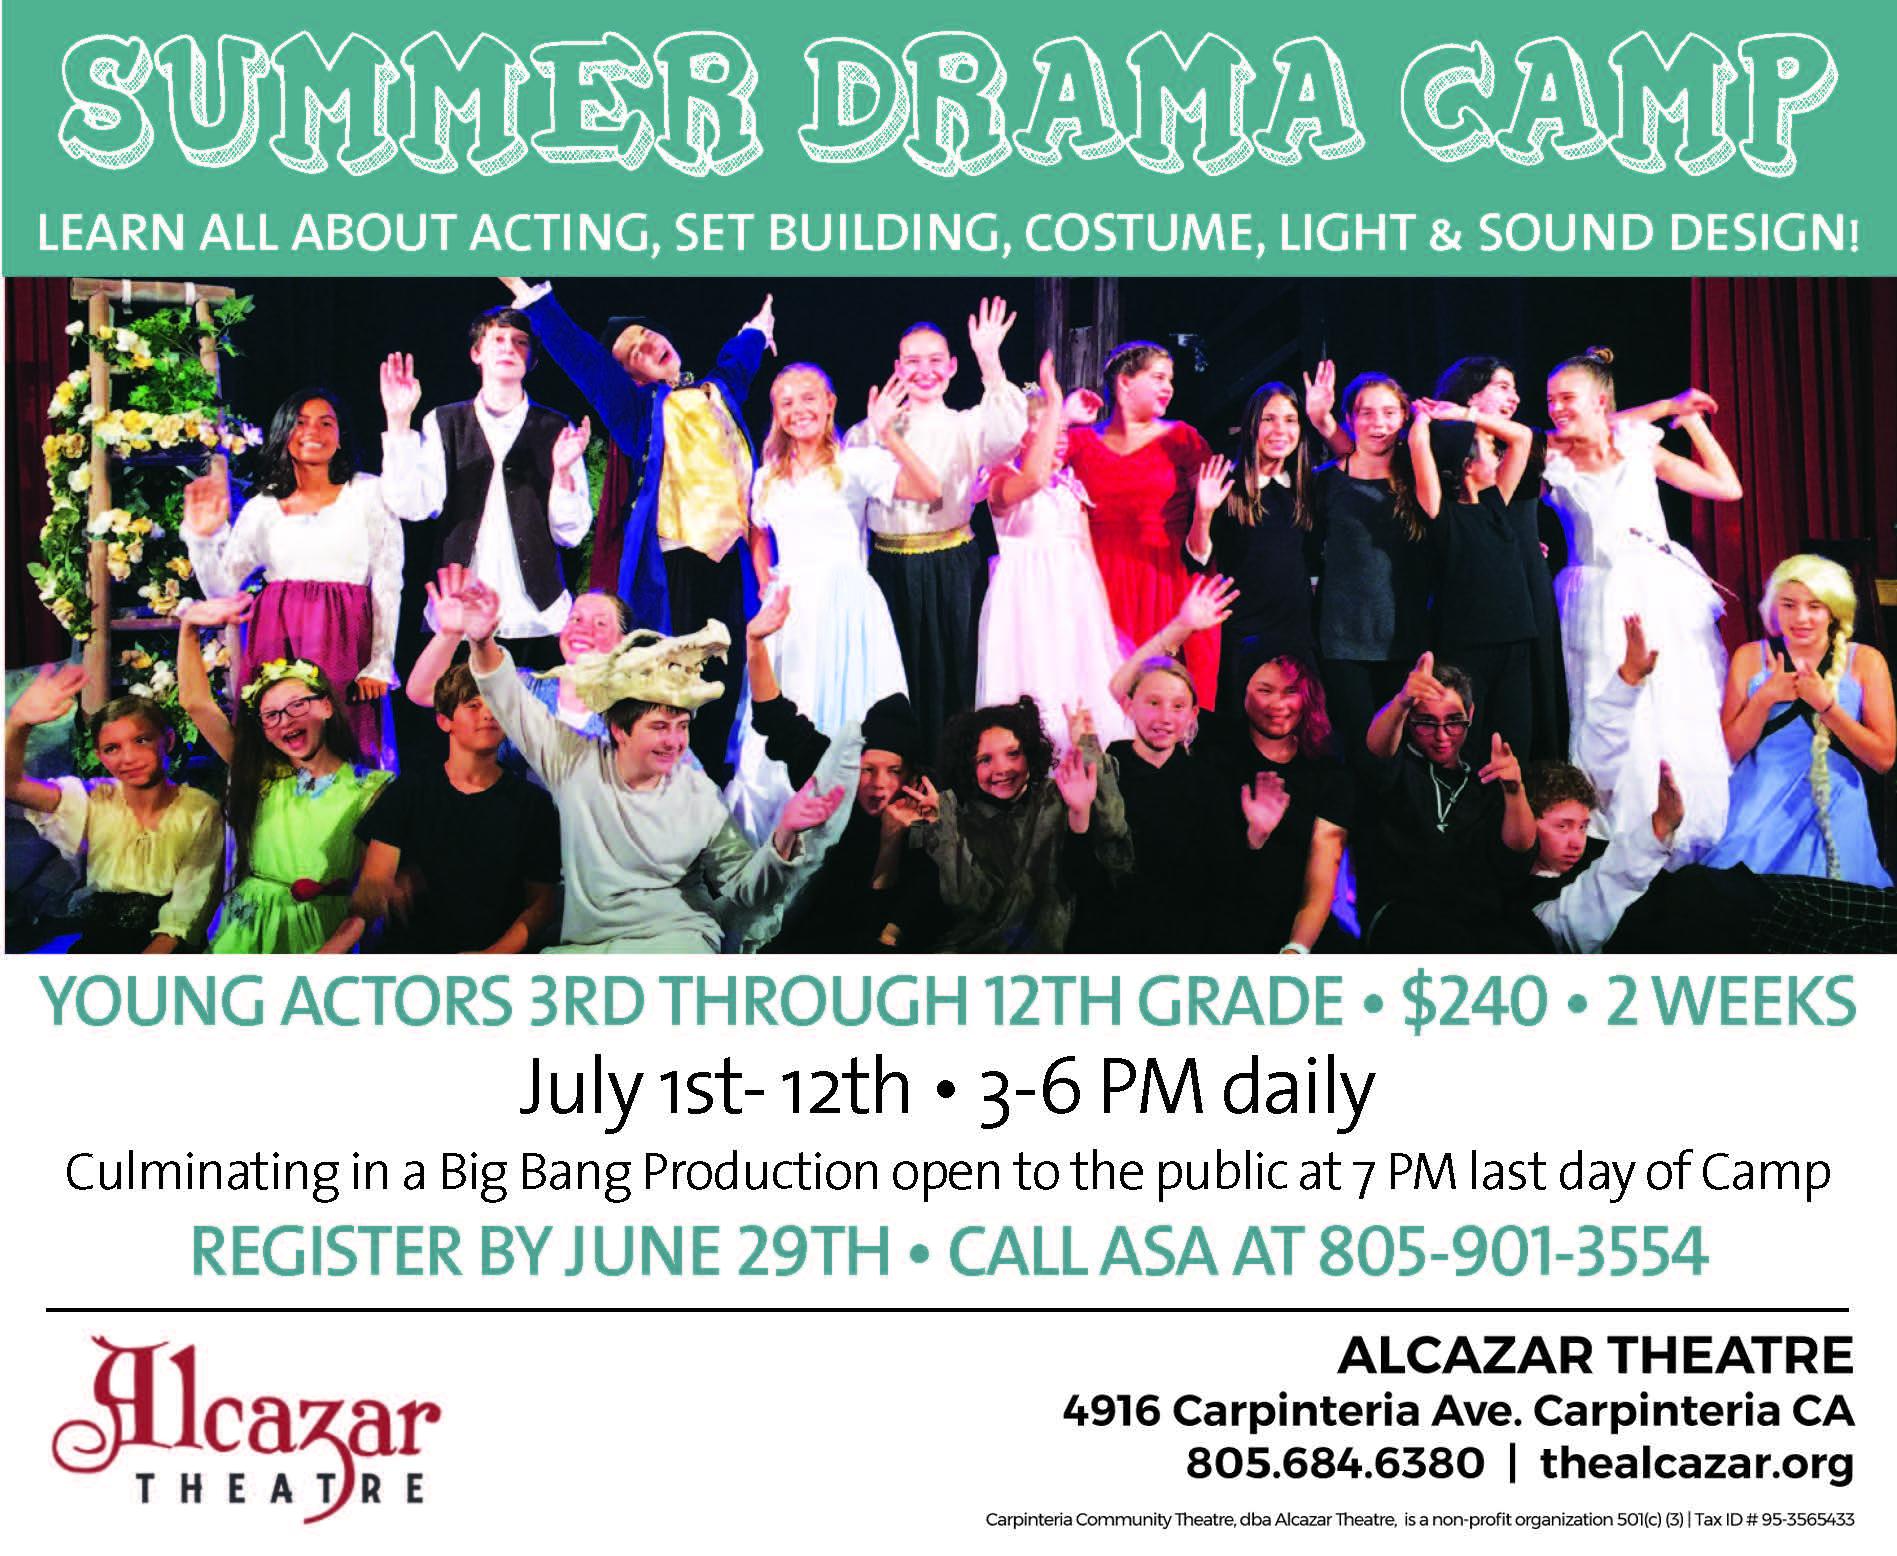 2019 Drama Camp